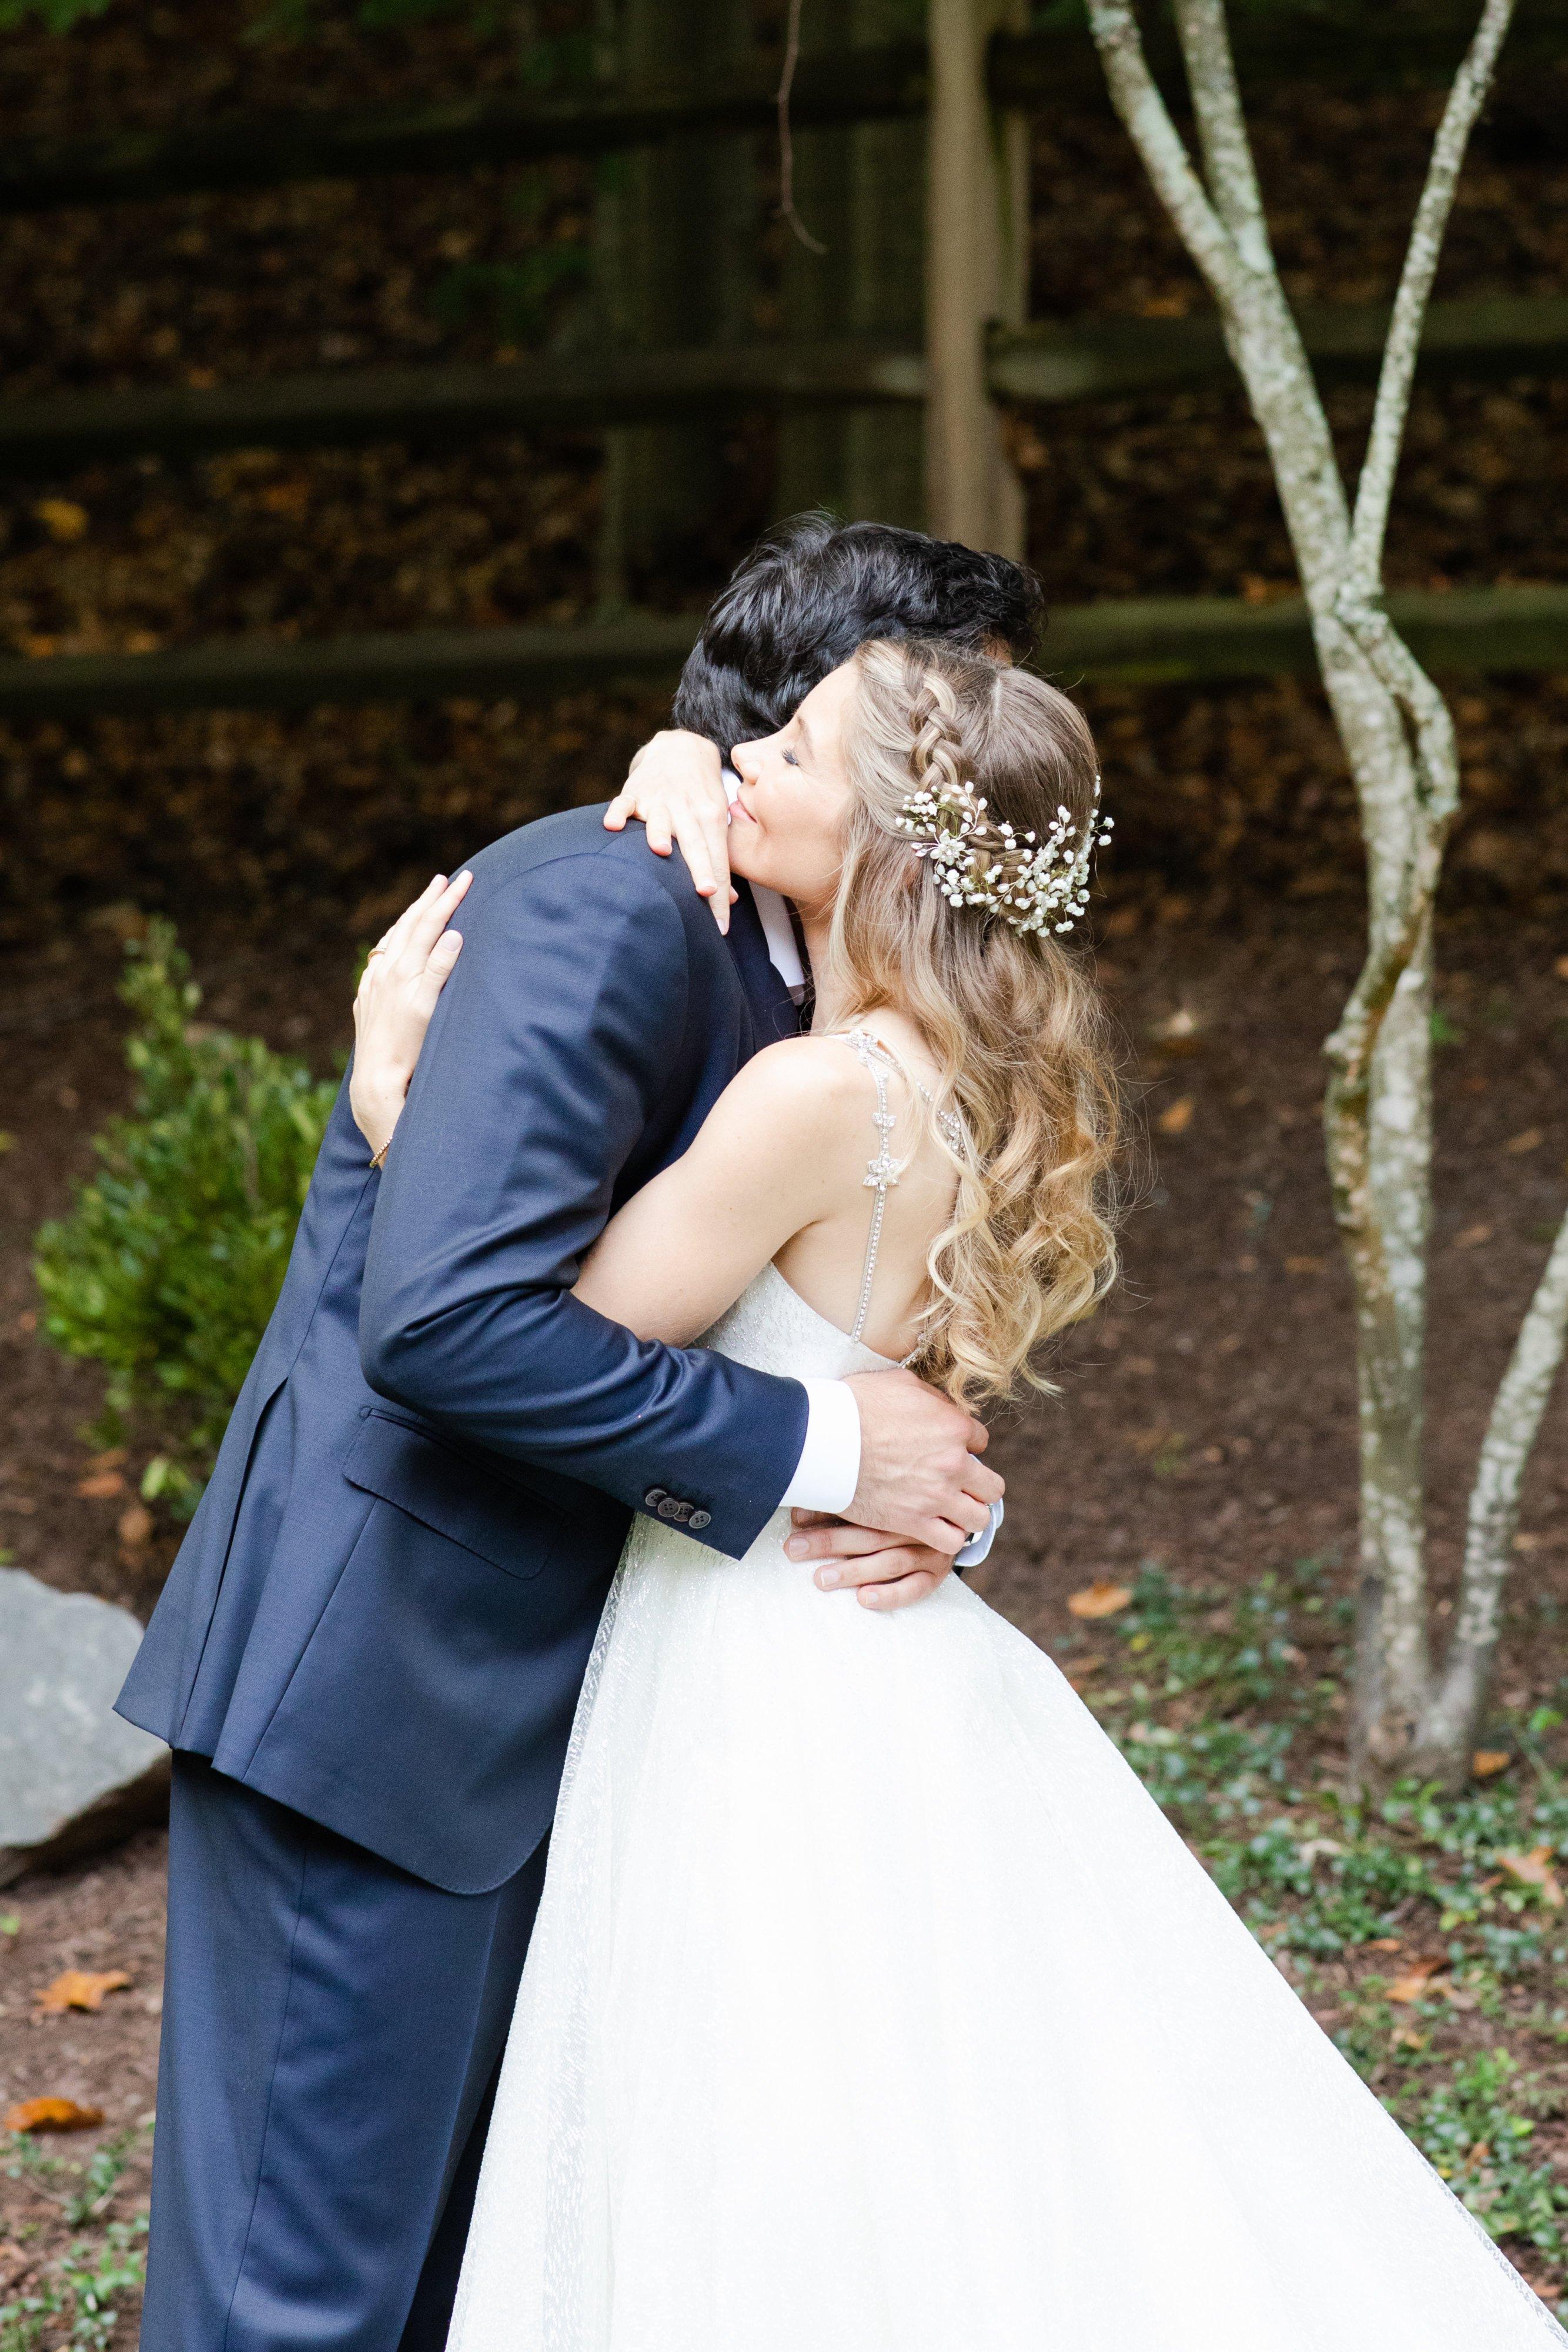 StefanieKamermanPhotography-MelanieandBenjamin-Wedding-Bethesda,MD-2019-10-12-120